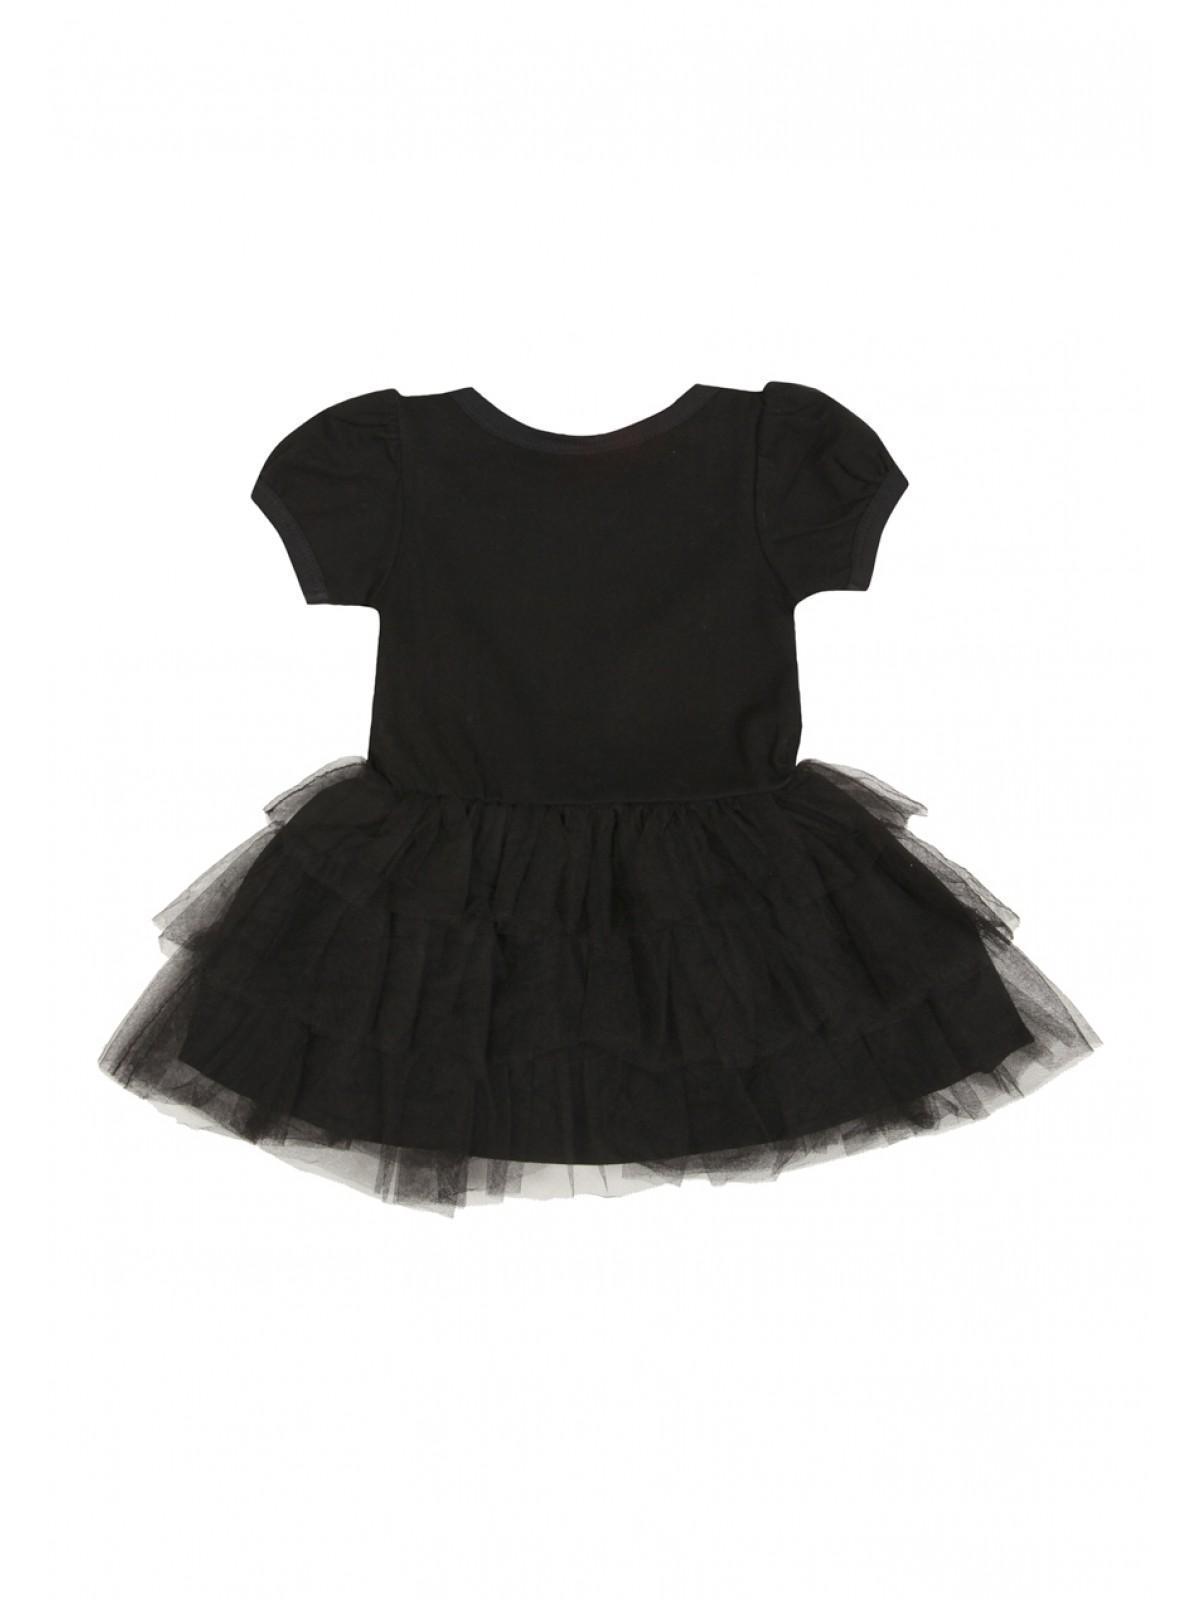 Girls Baby Birl Little Black Dress